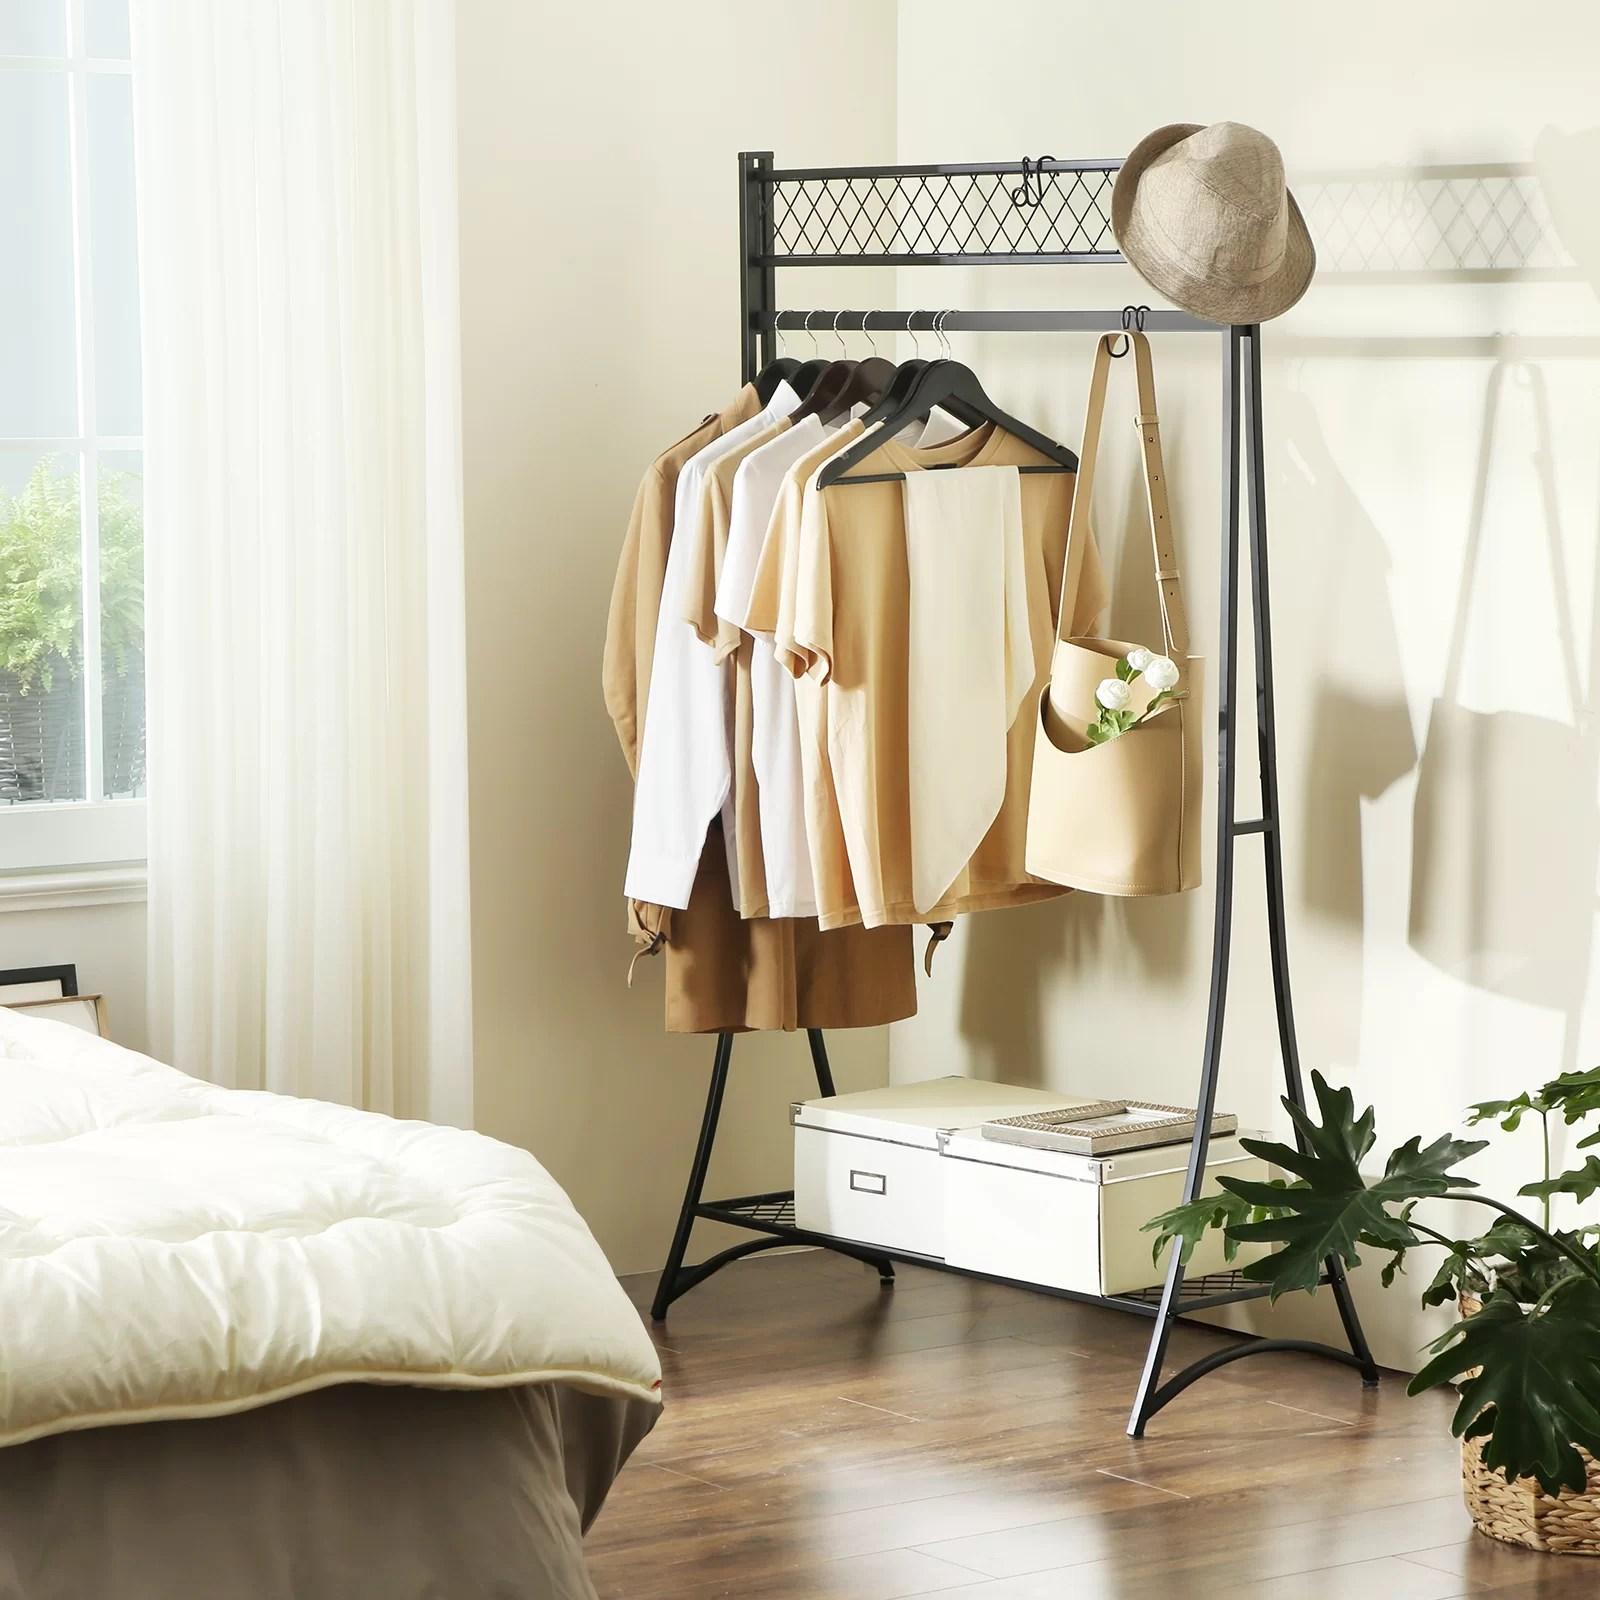 clothes hanger rack cheaper than retail